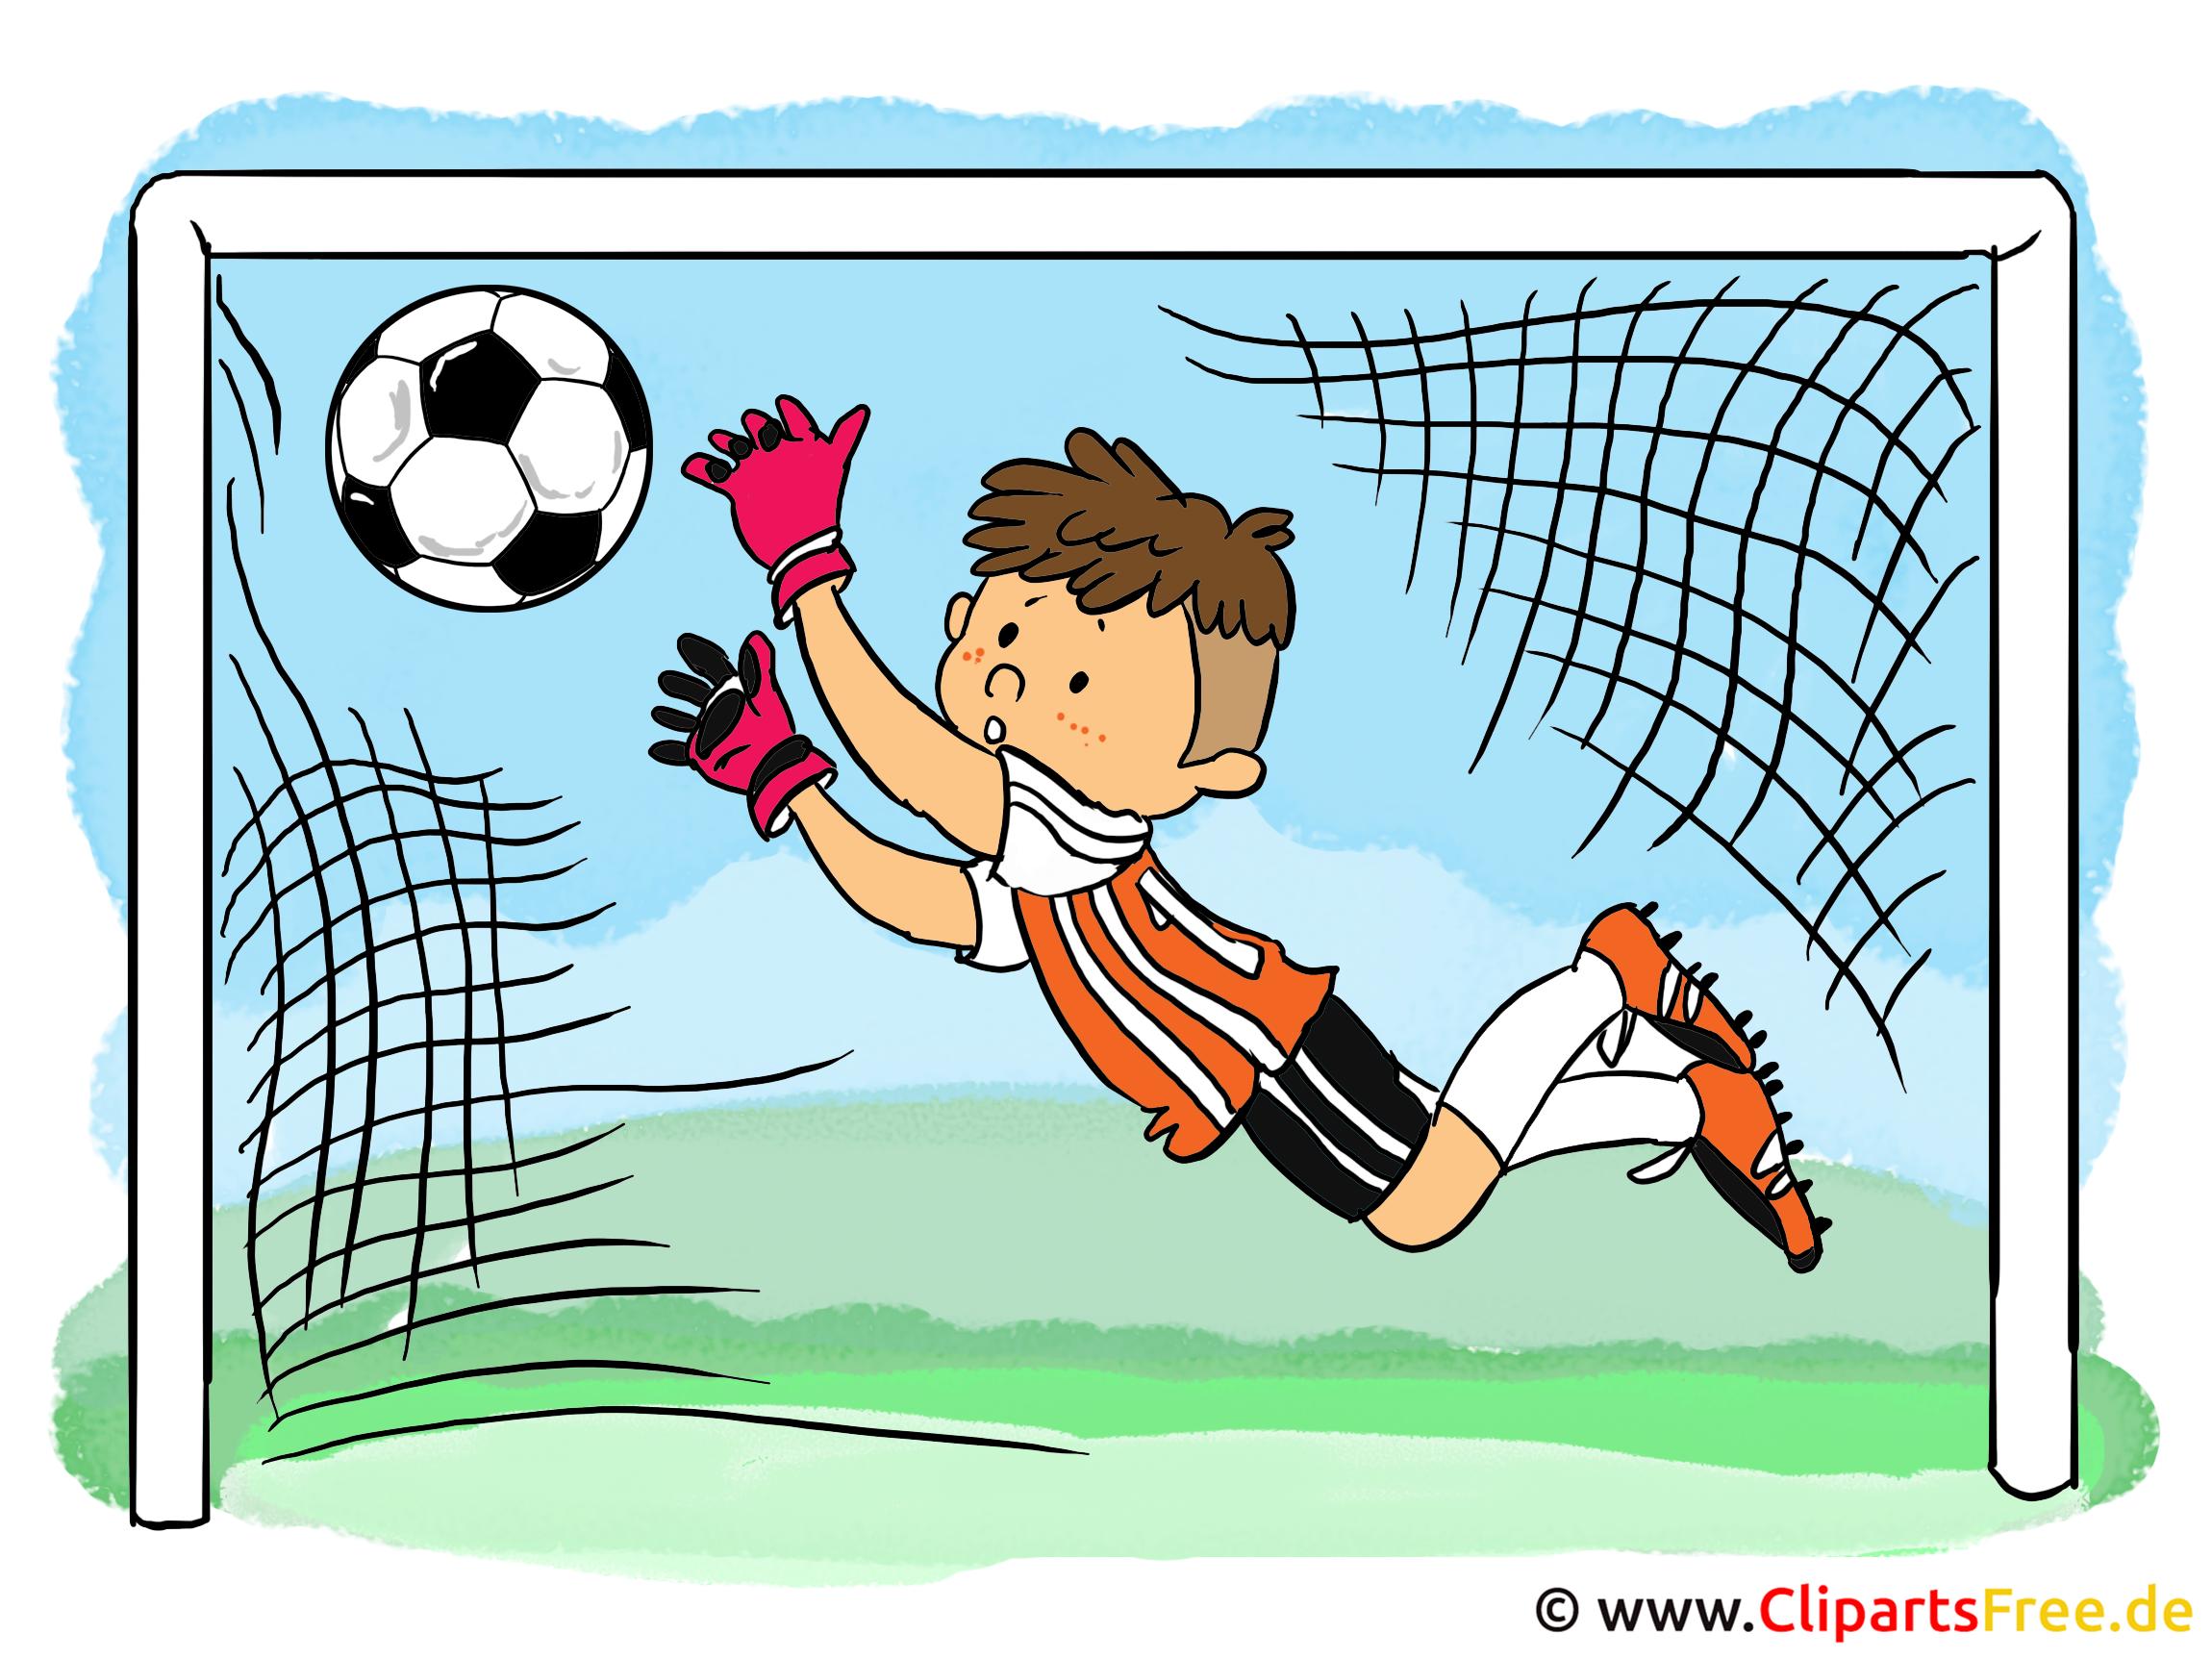 Illustration f r kinderbuch fussball torwart kid - Dessin gardien de but ...